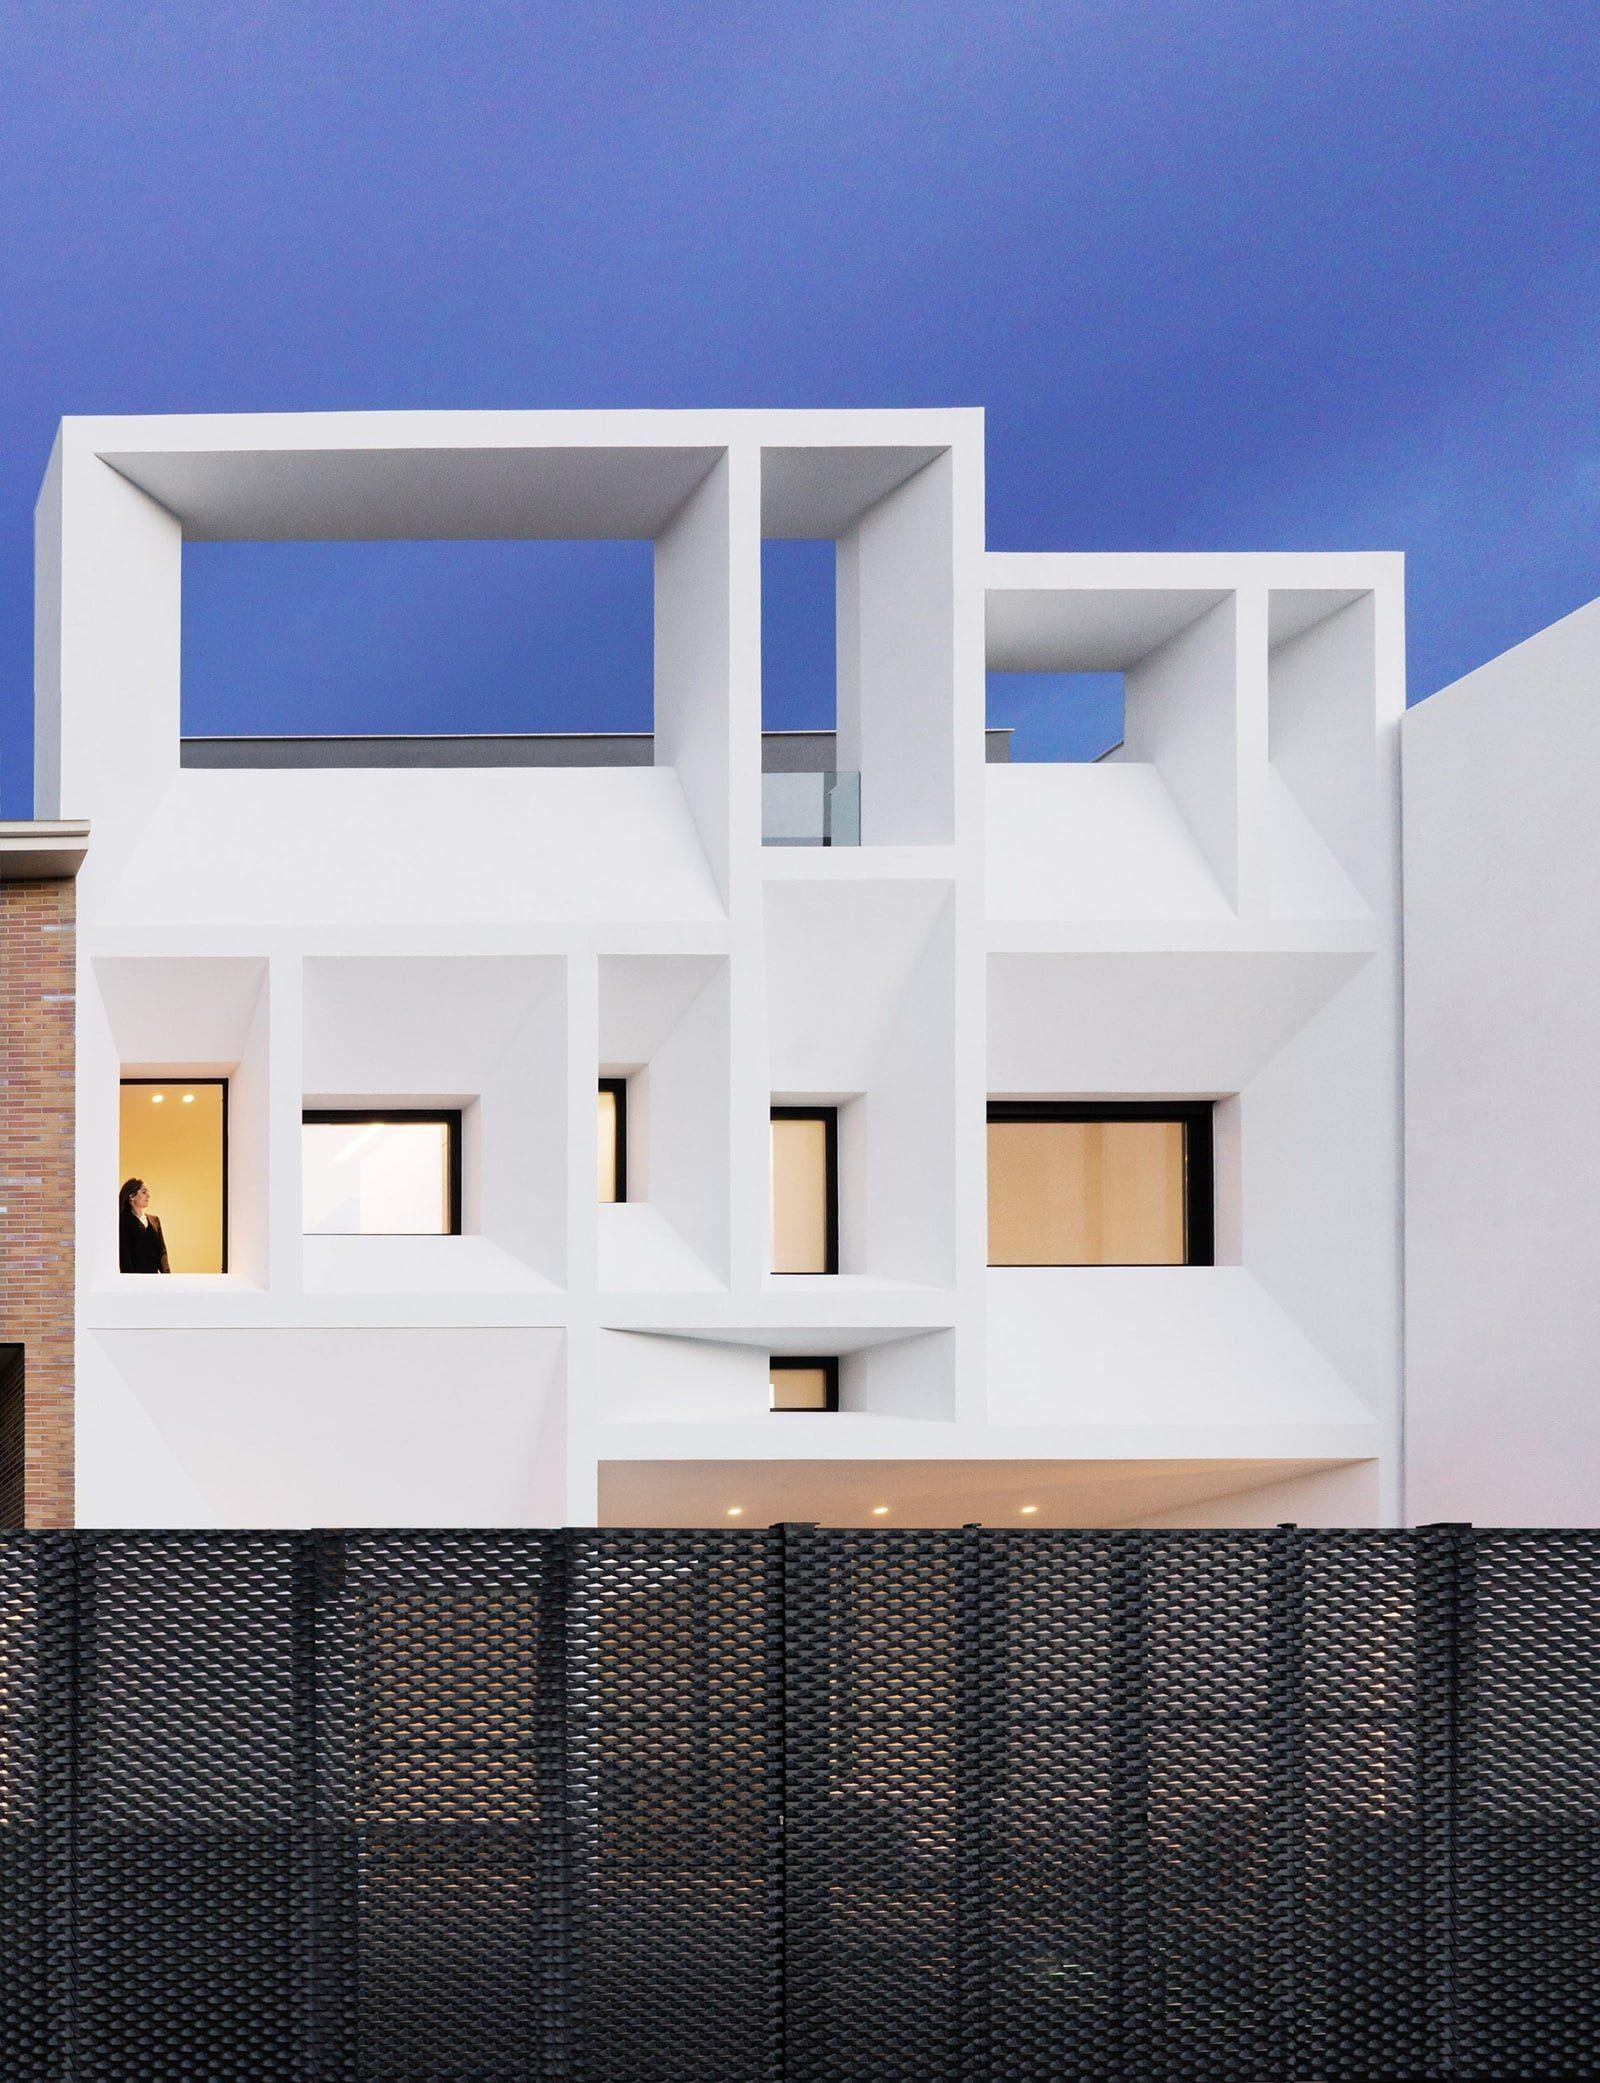 brise soleil house – minimalissimo | architecture | pinterest